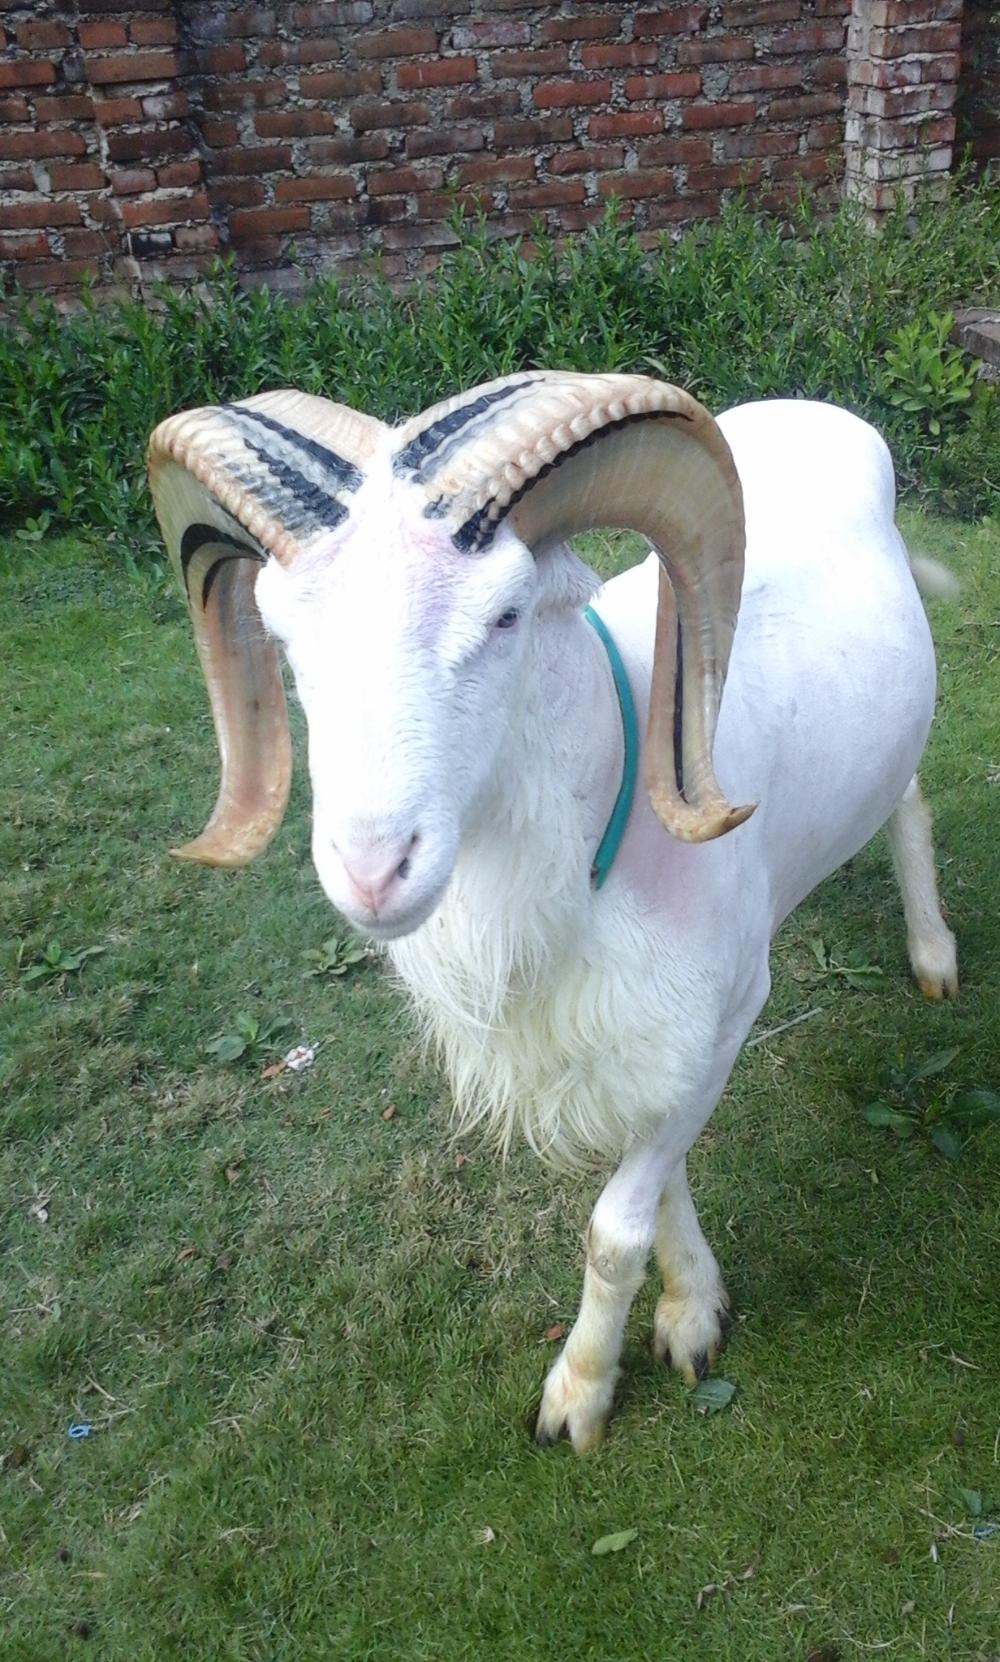 Foto Af Garut Fighting Sheep – Om Husdyrstalde | Domba within Gambar Domba Hd